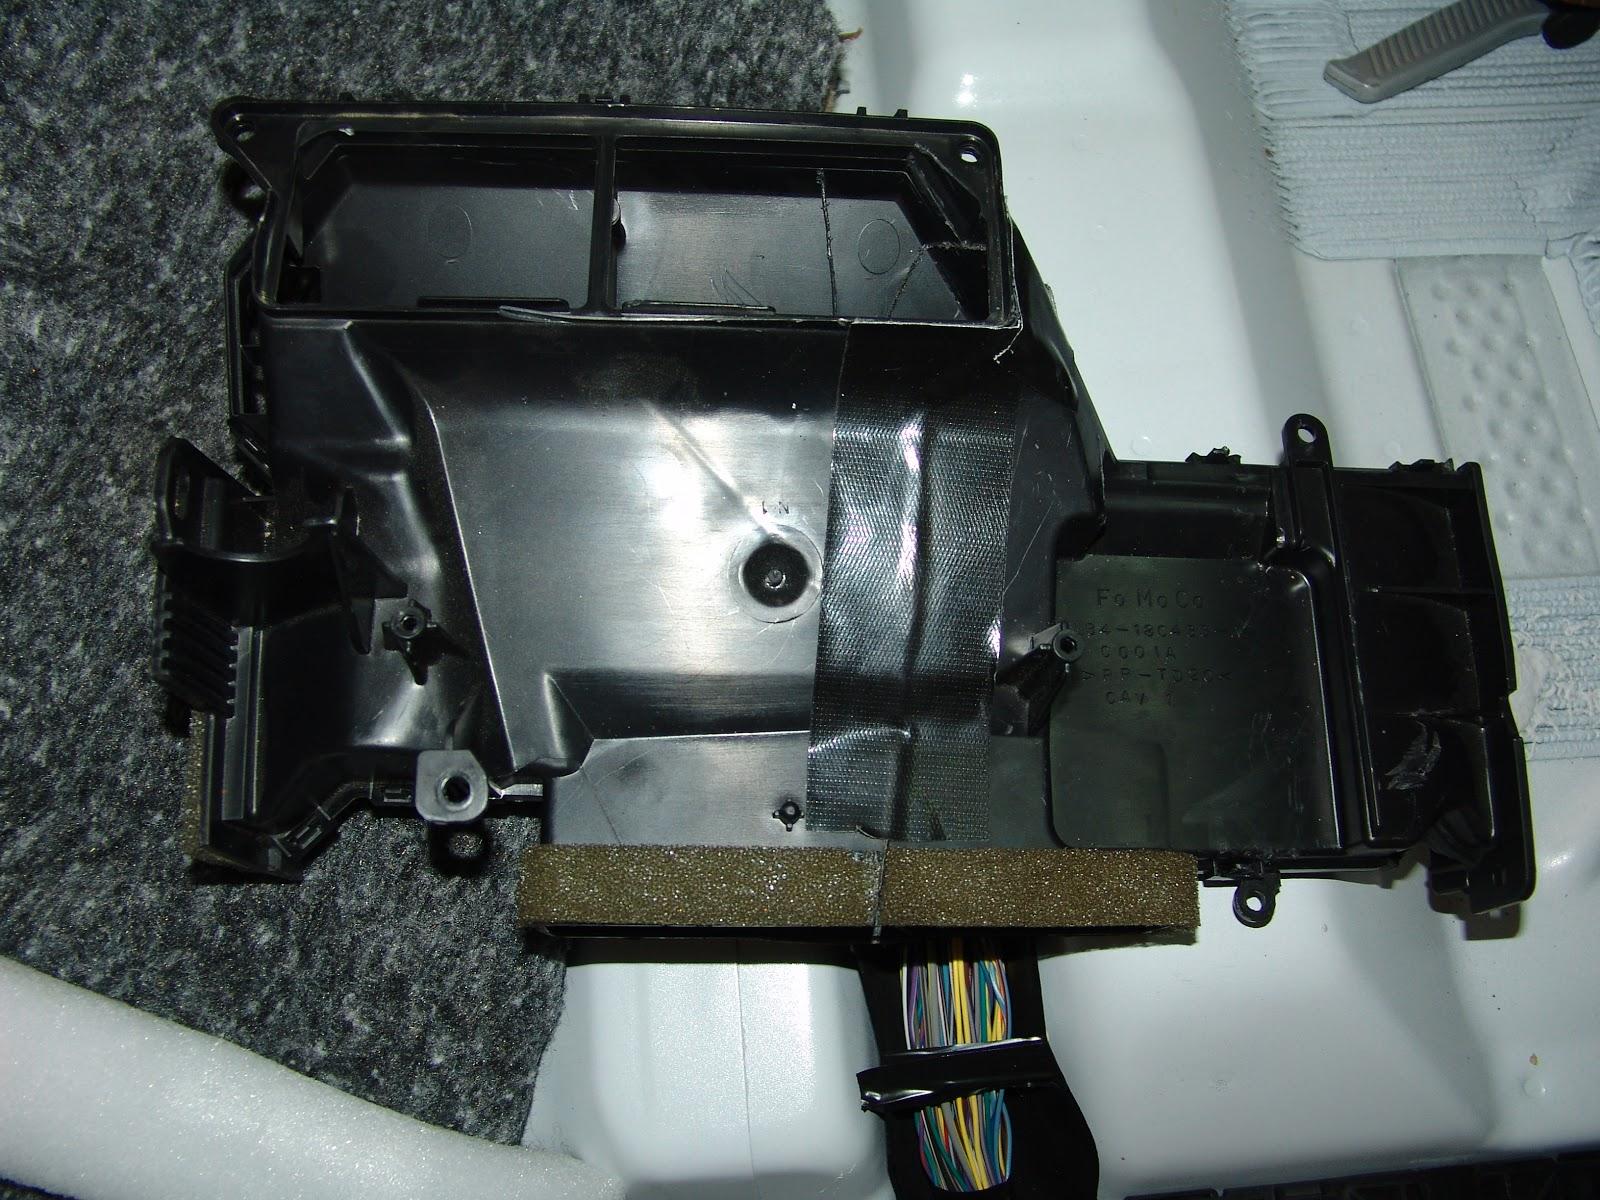 Mazda B2500 Fuse Box Diagram As Well Ignition Module Wiring Diagram